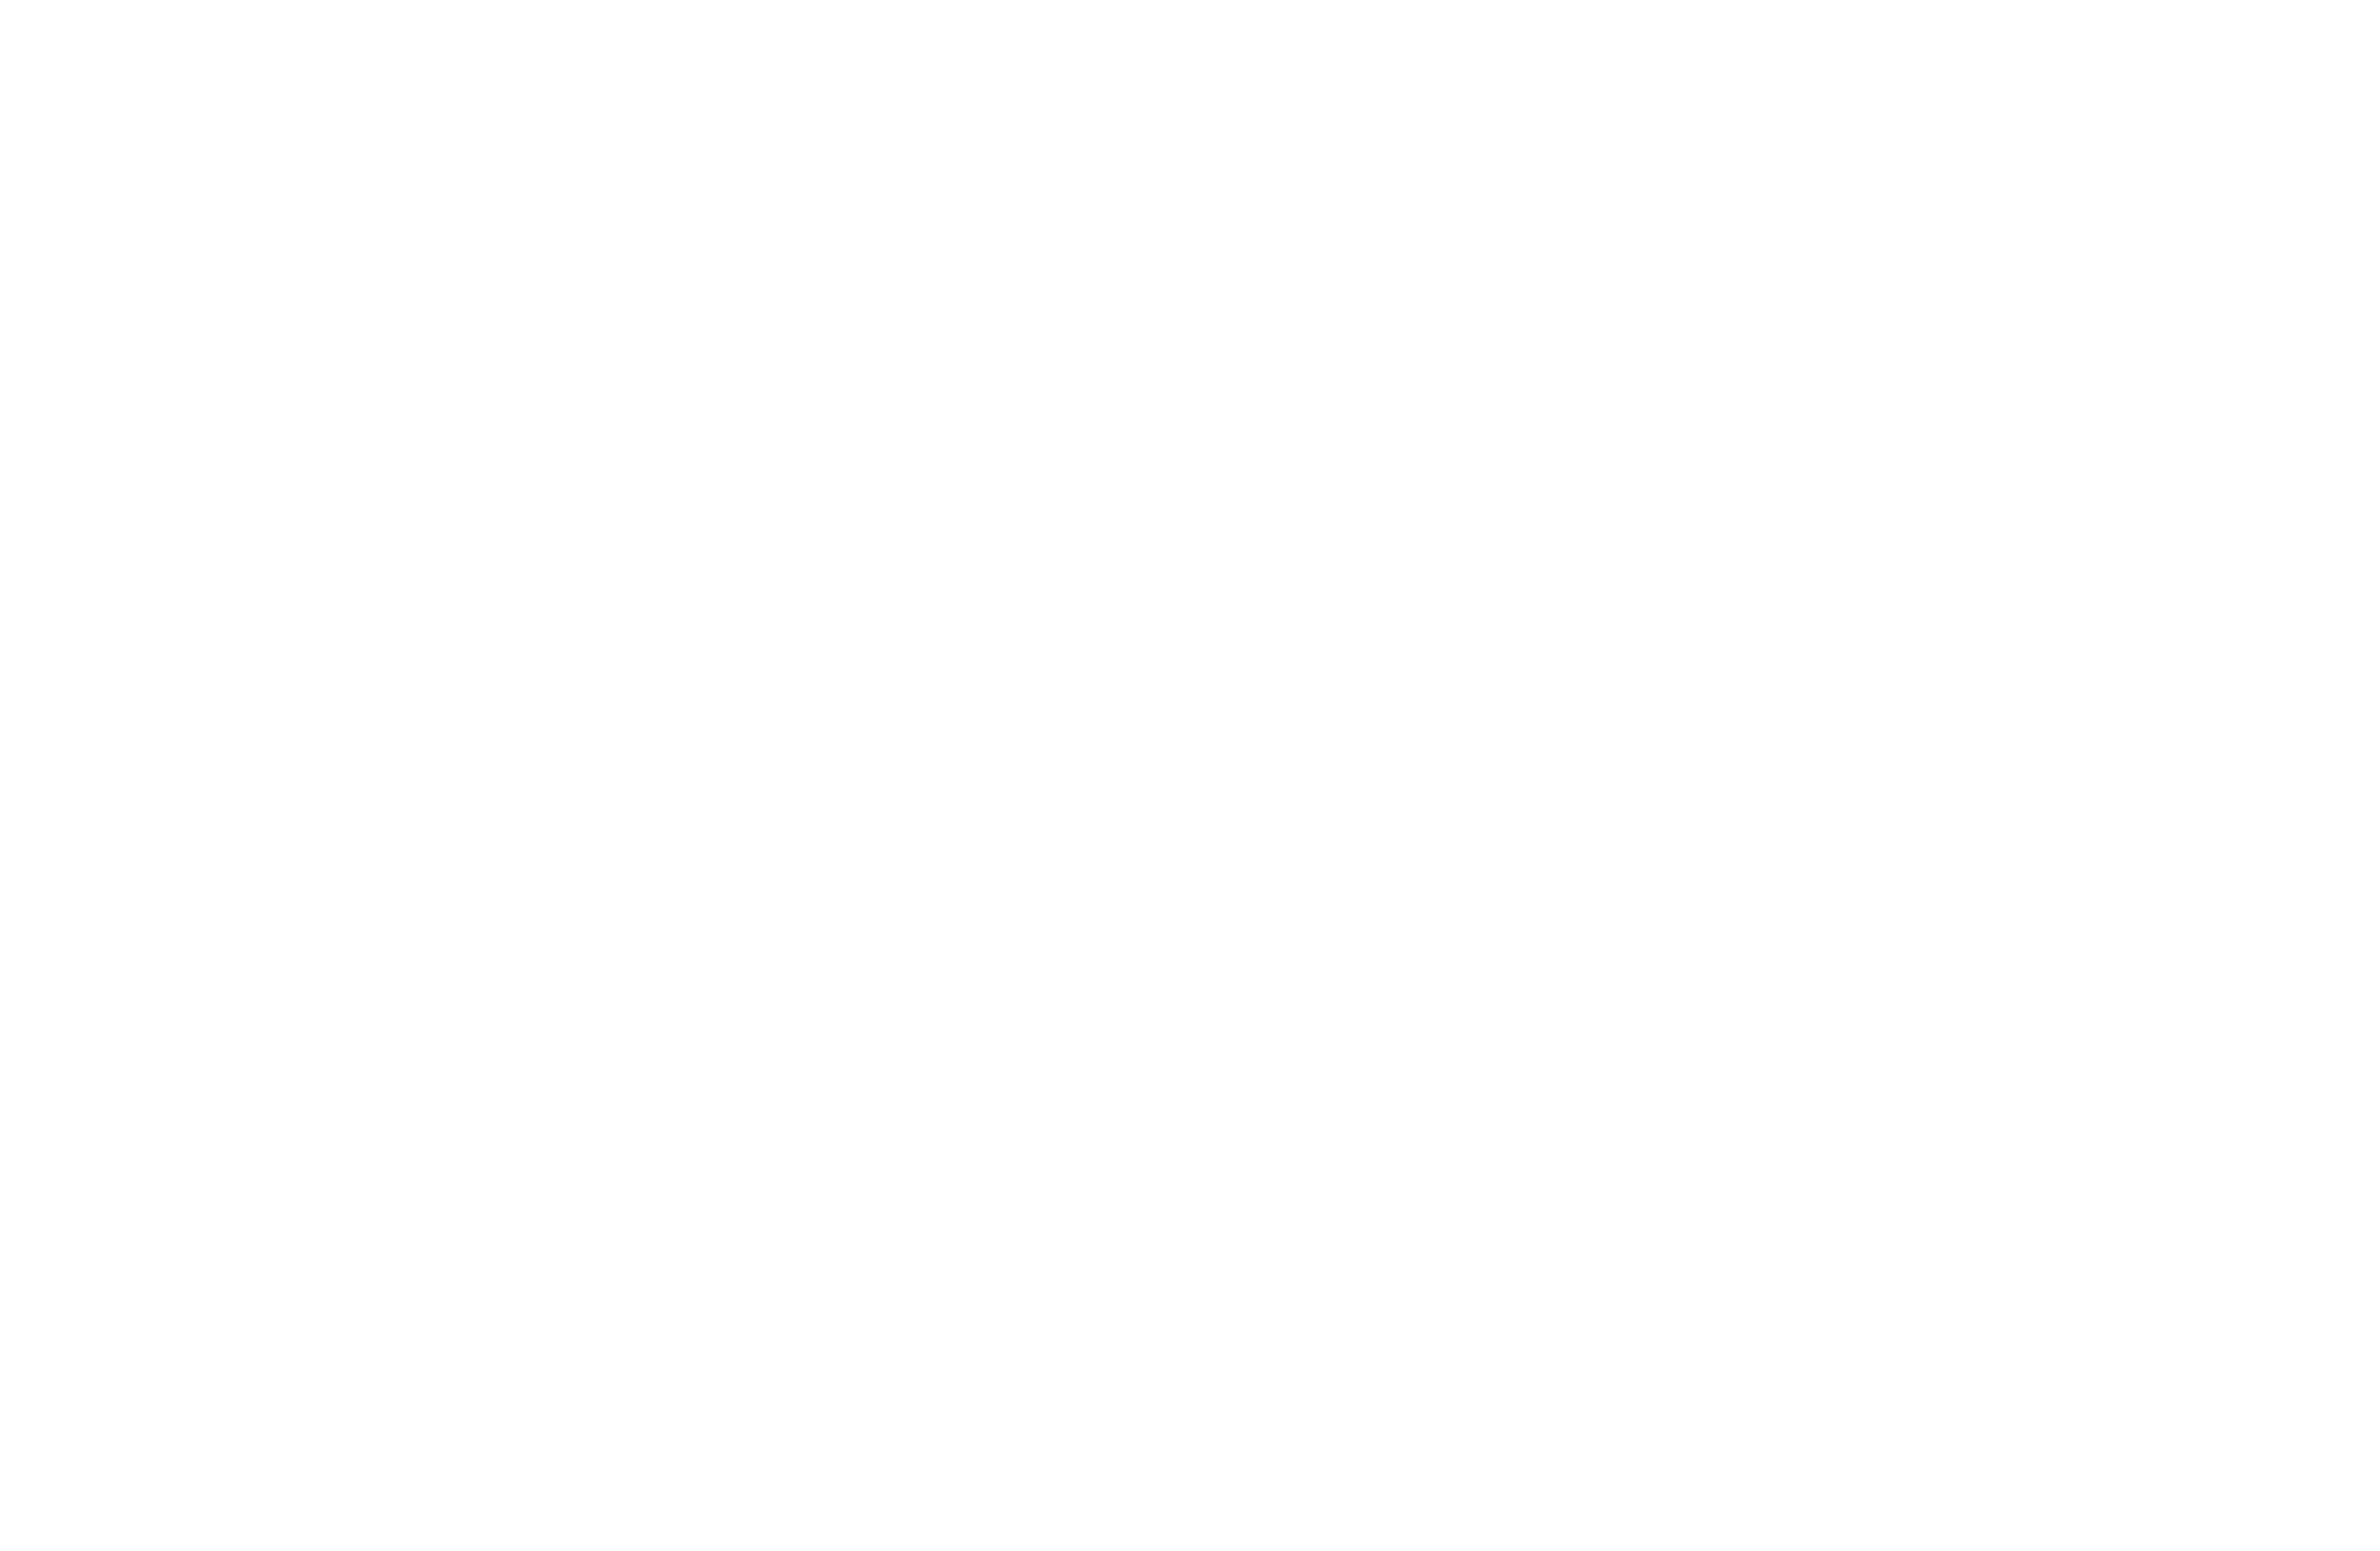 manuelawittlich-vertraut-getraut.de